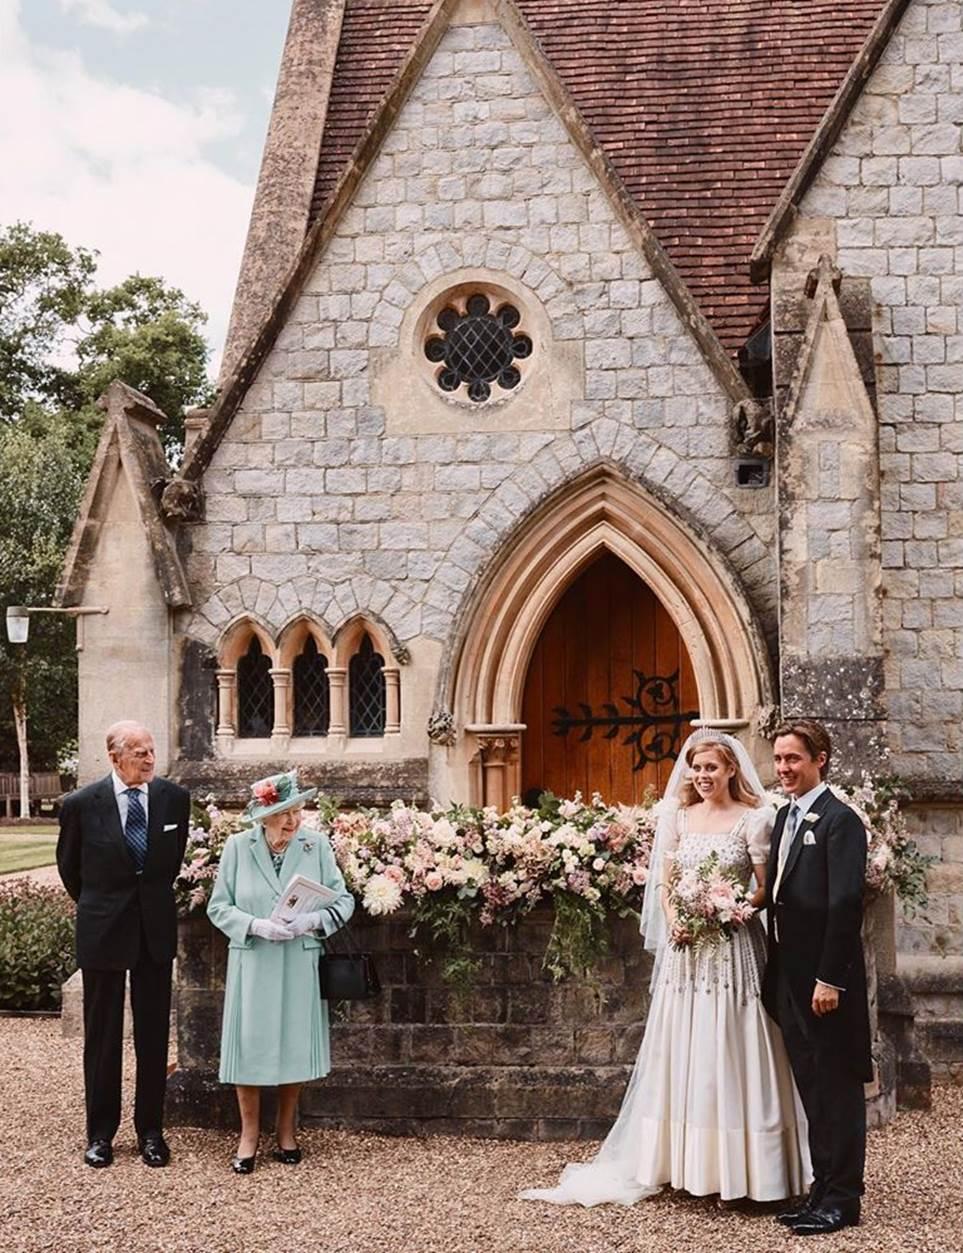 Pernikahan Princess Beatrice of York dan Edoardo Mapelli Mozzi. (Foto Harper's Bazaar)